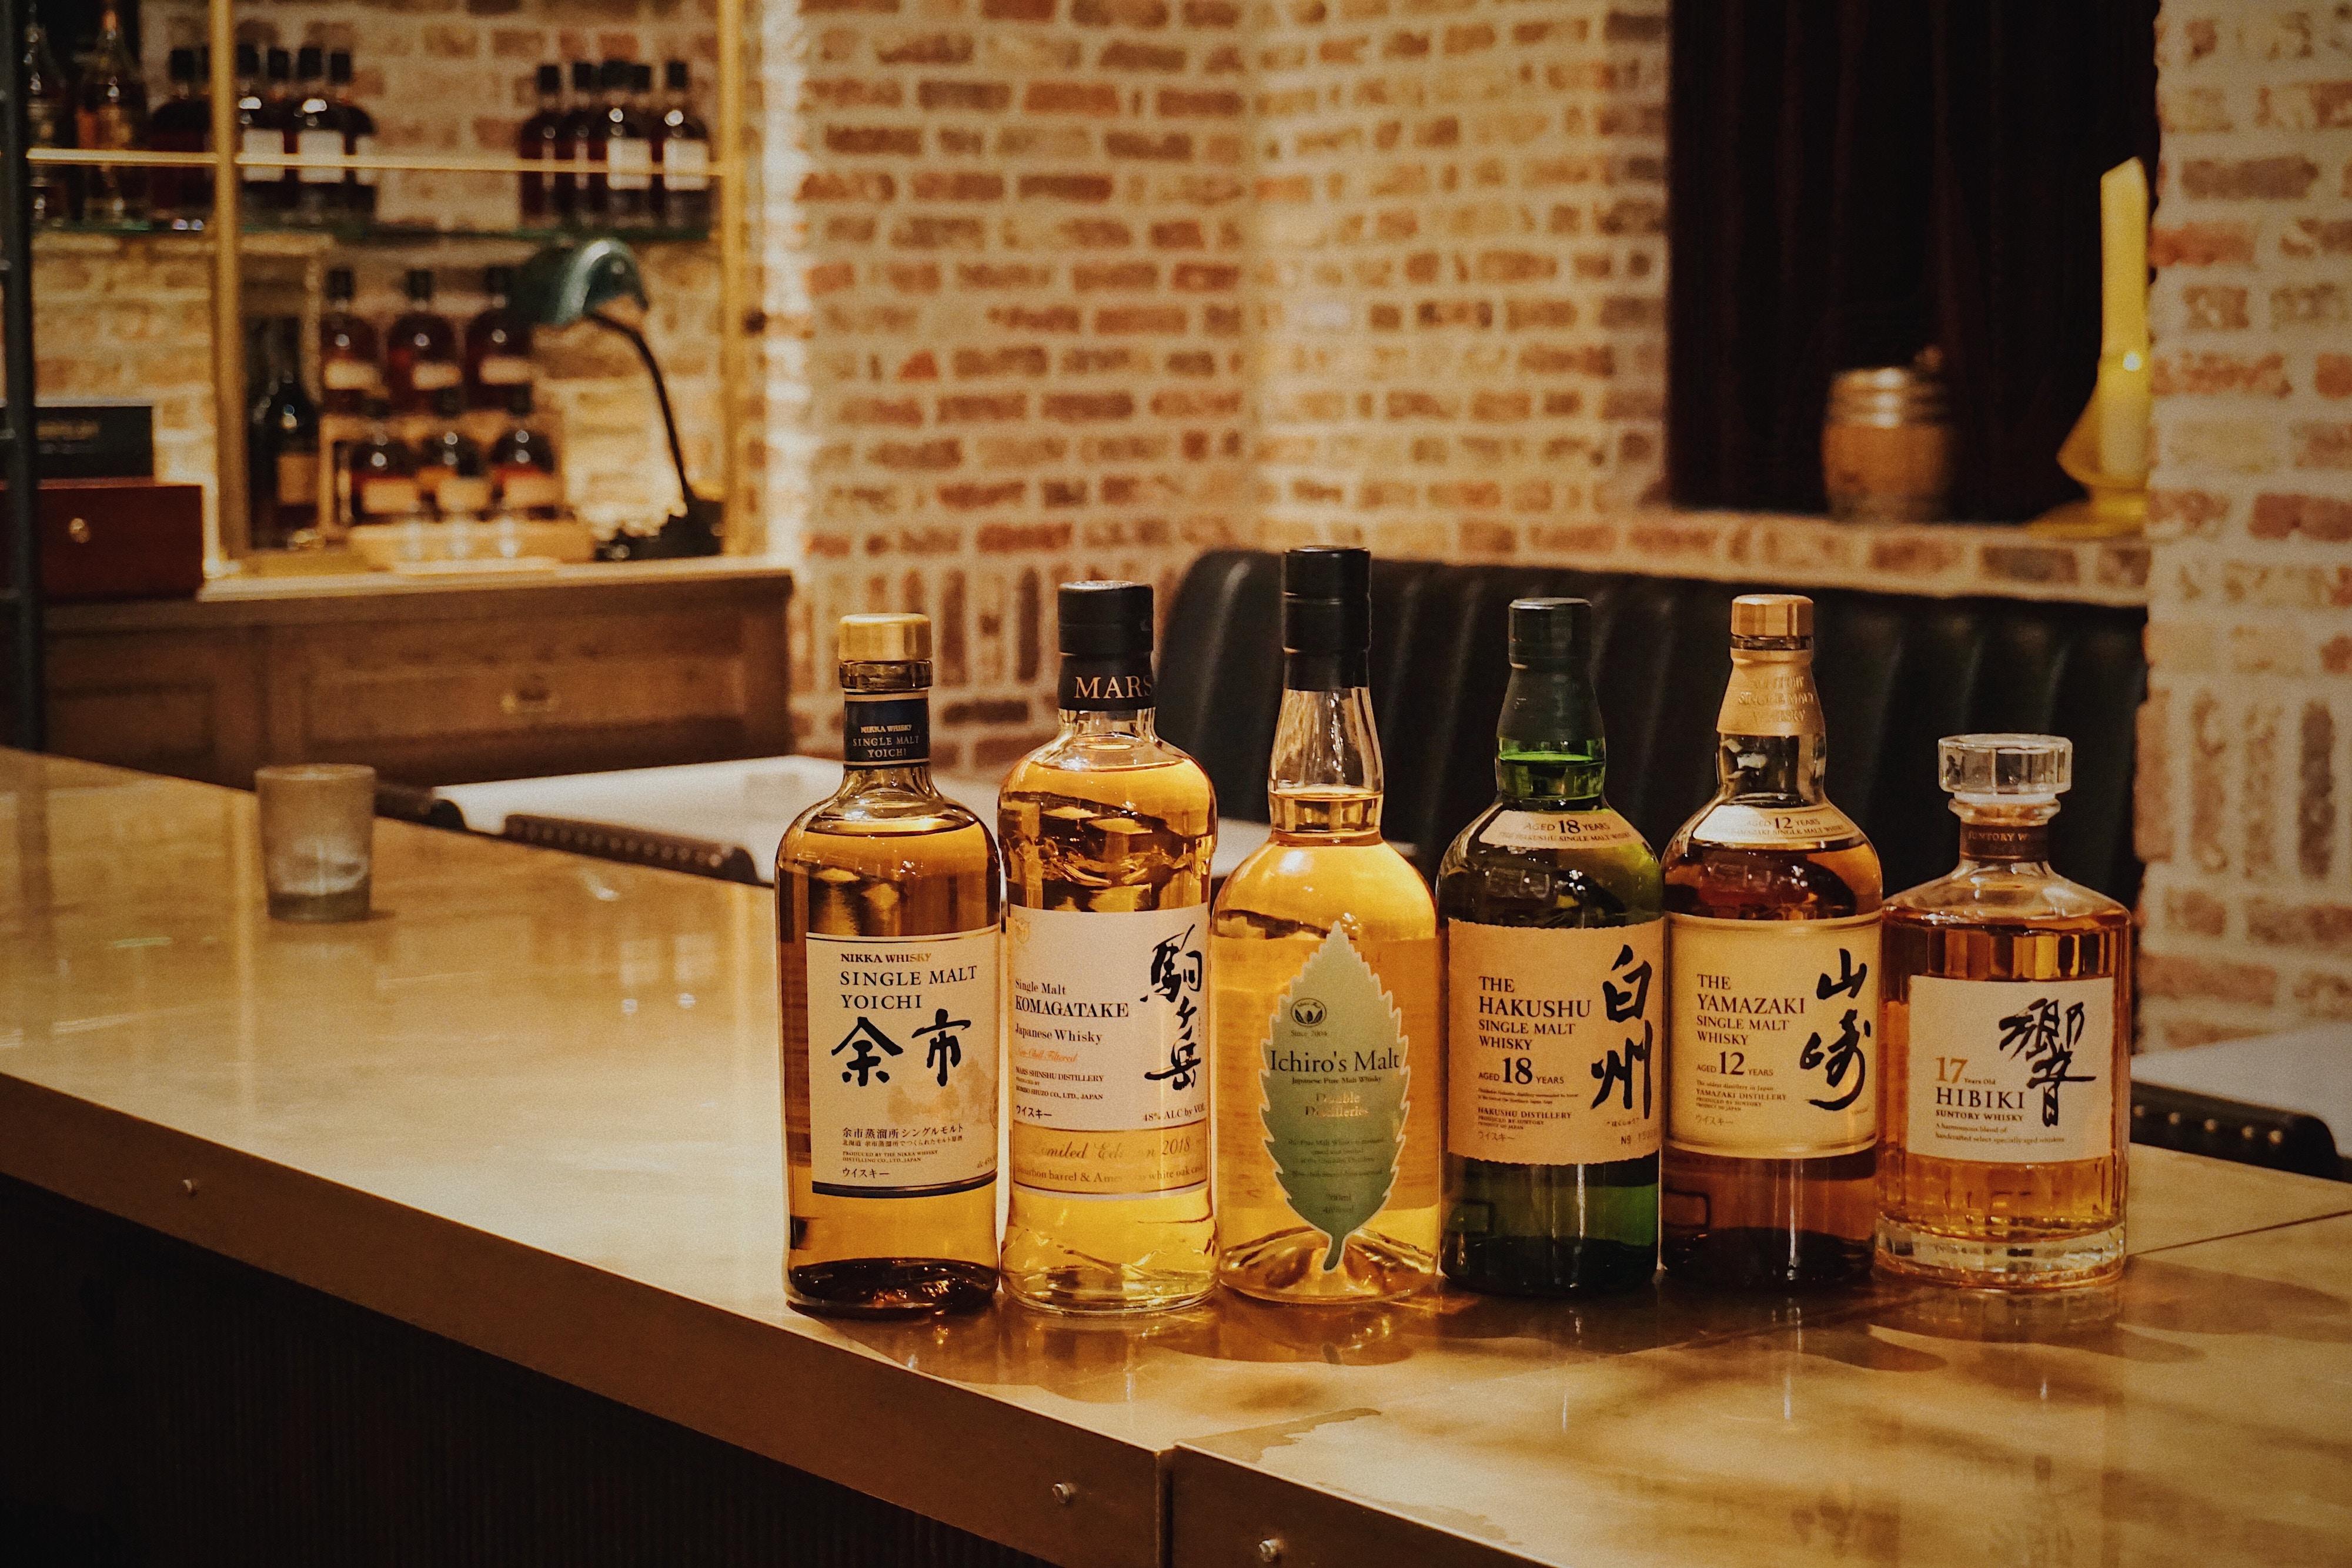 Rum Tasting FUNdraiser, March 31, 2019